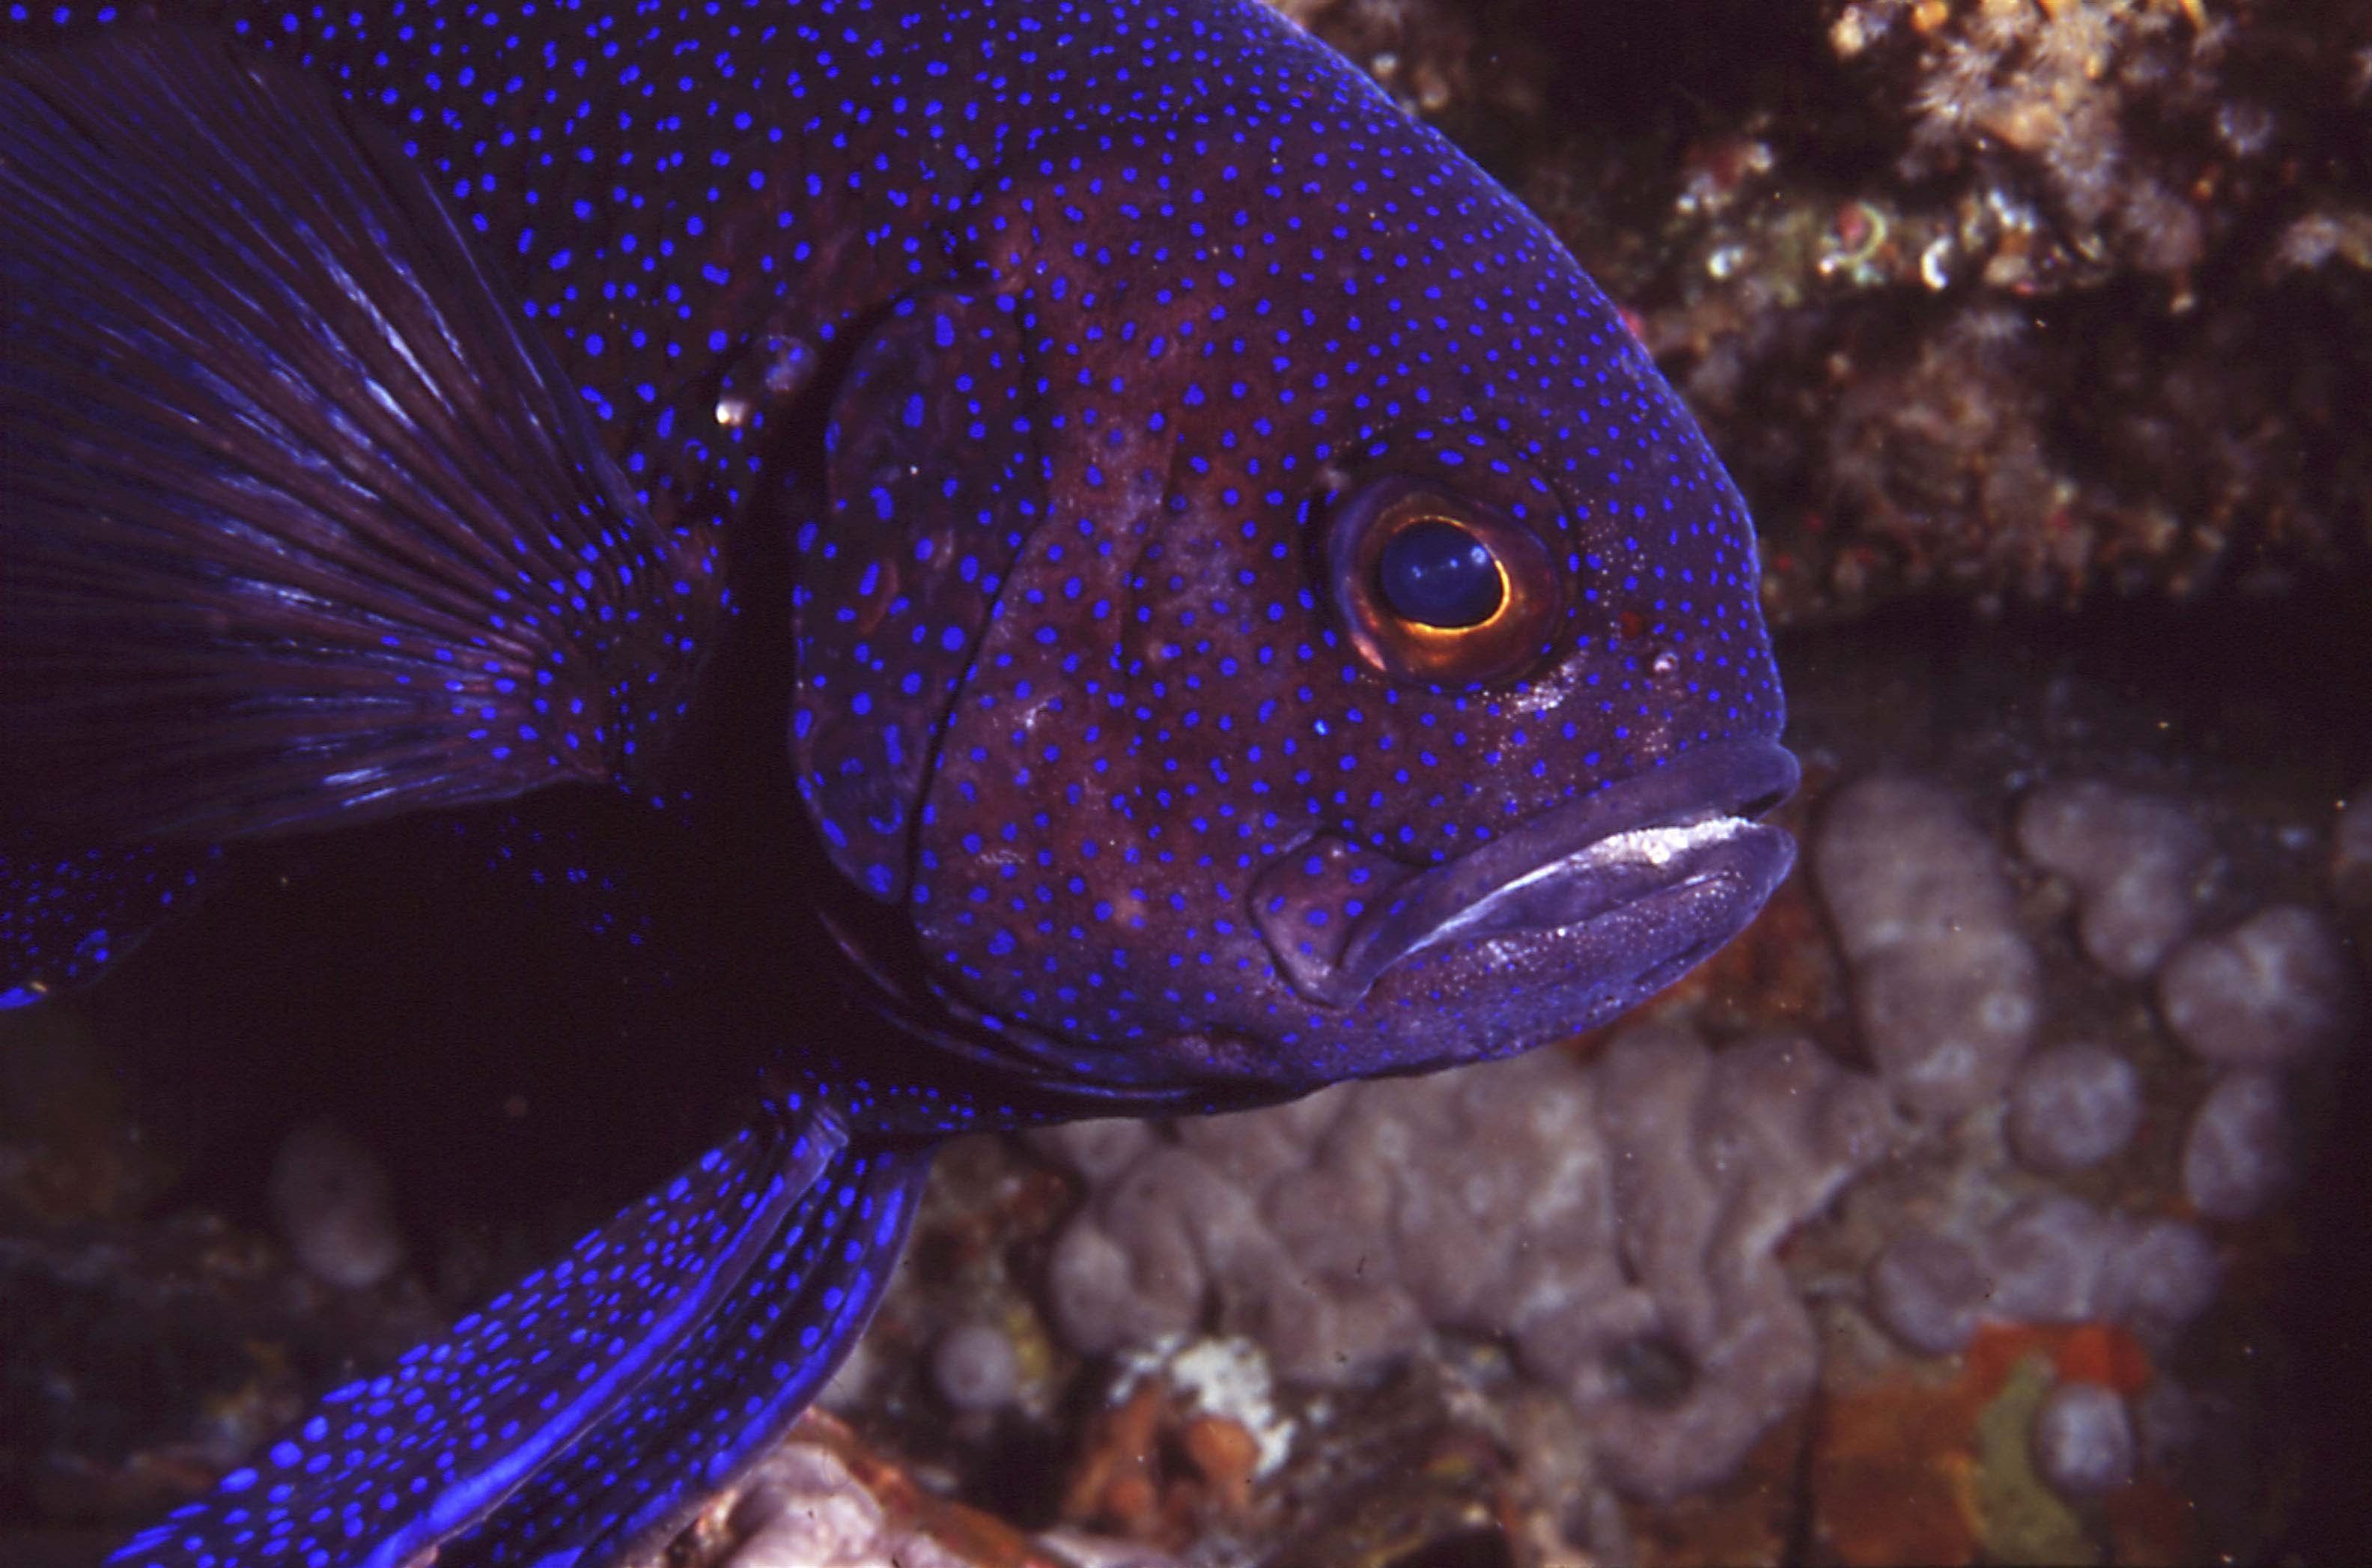 Sthn Blue Devil up close in ledge,nth cst KI SA  Underwater photographer:  David Muirhead